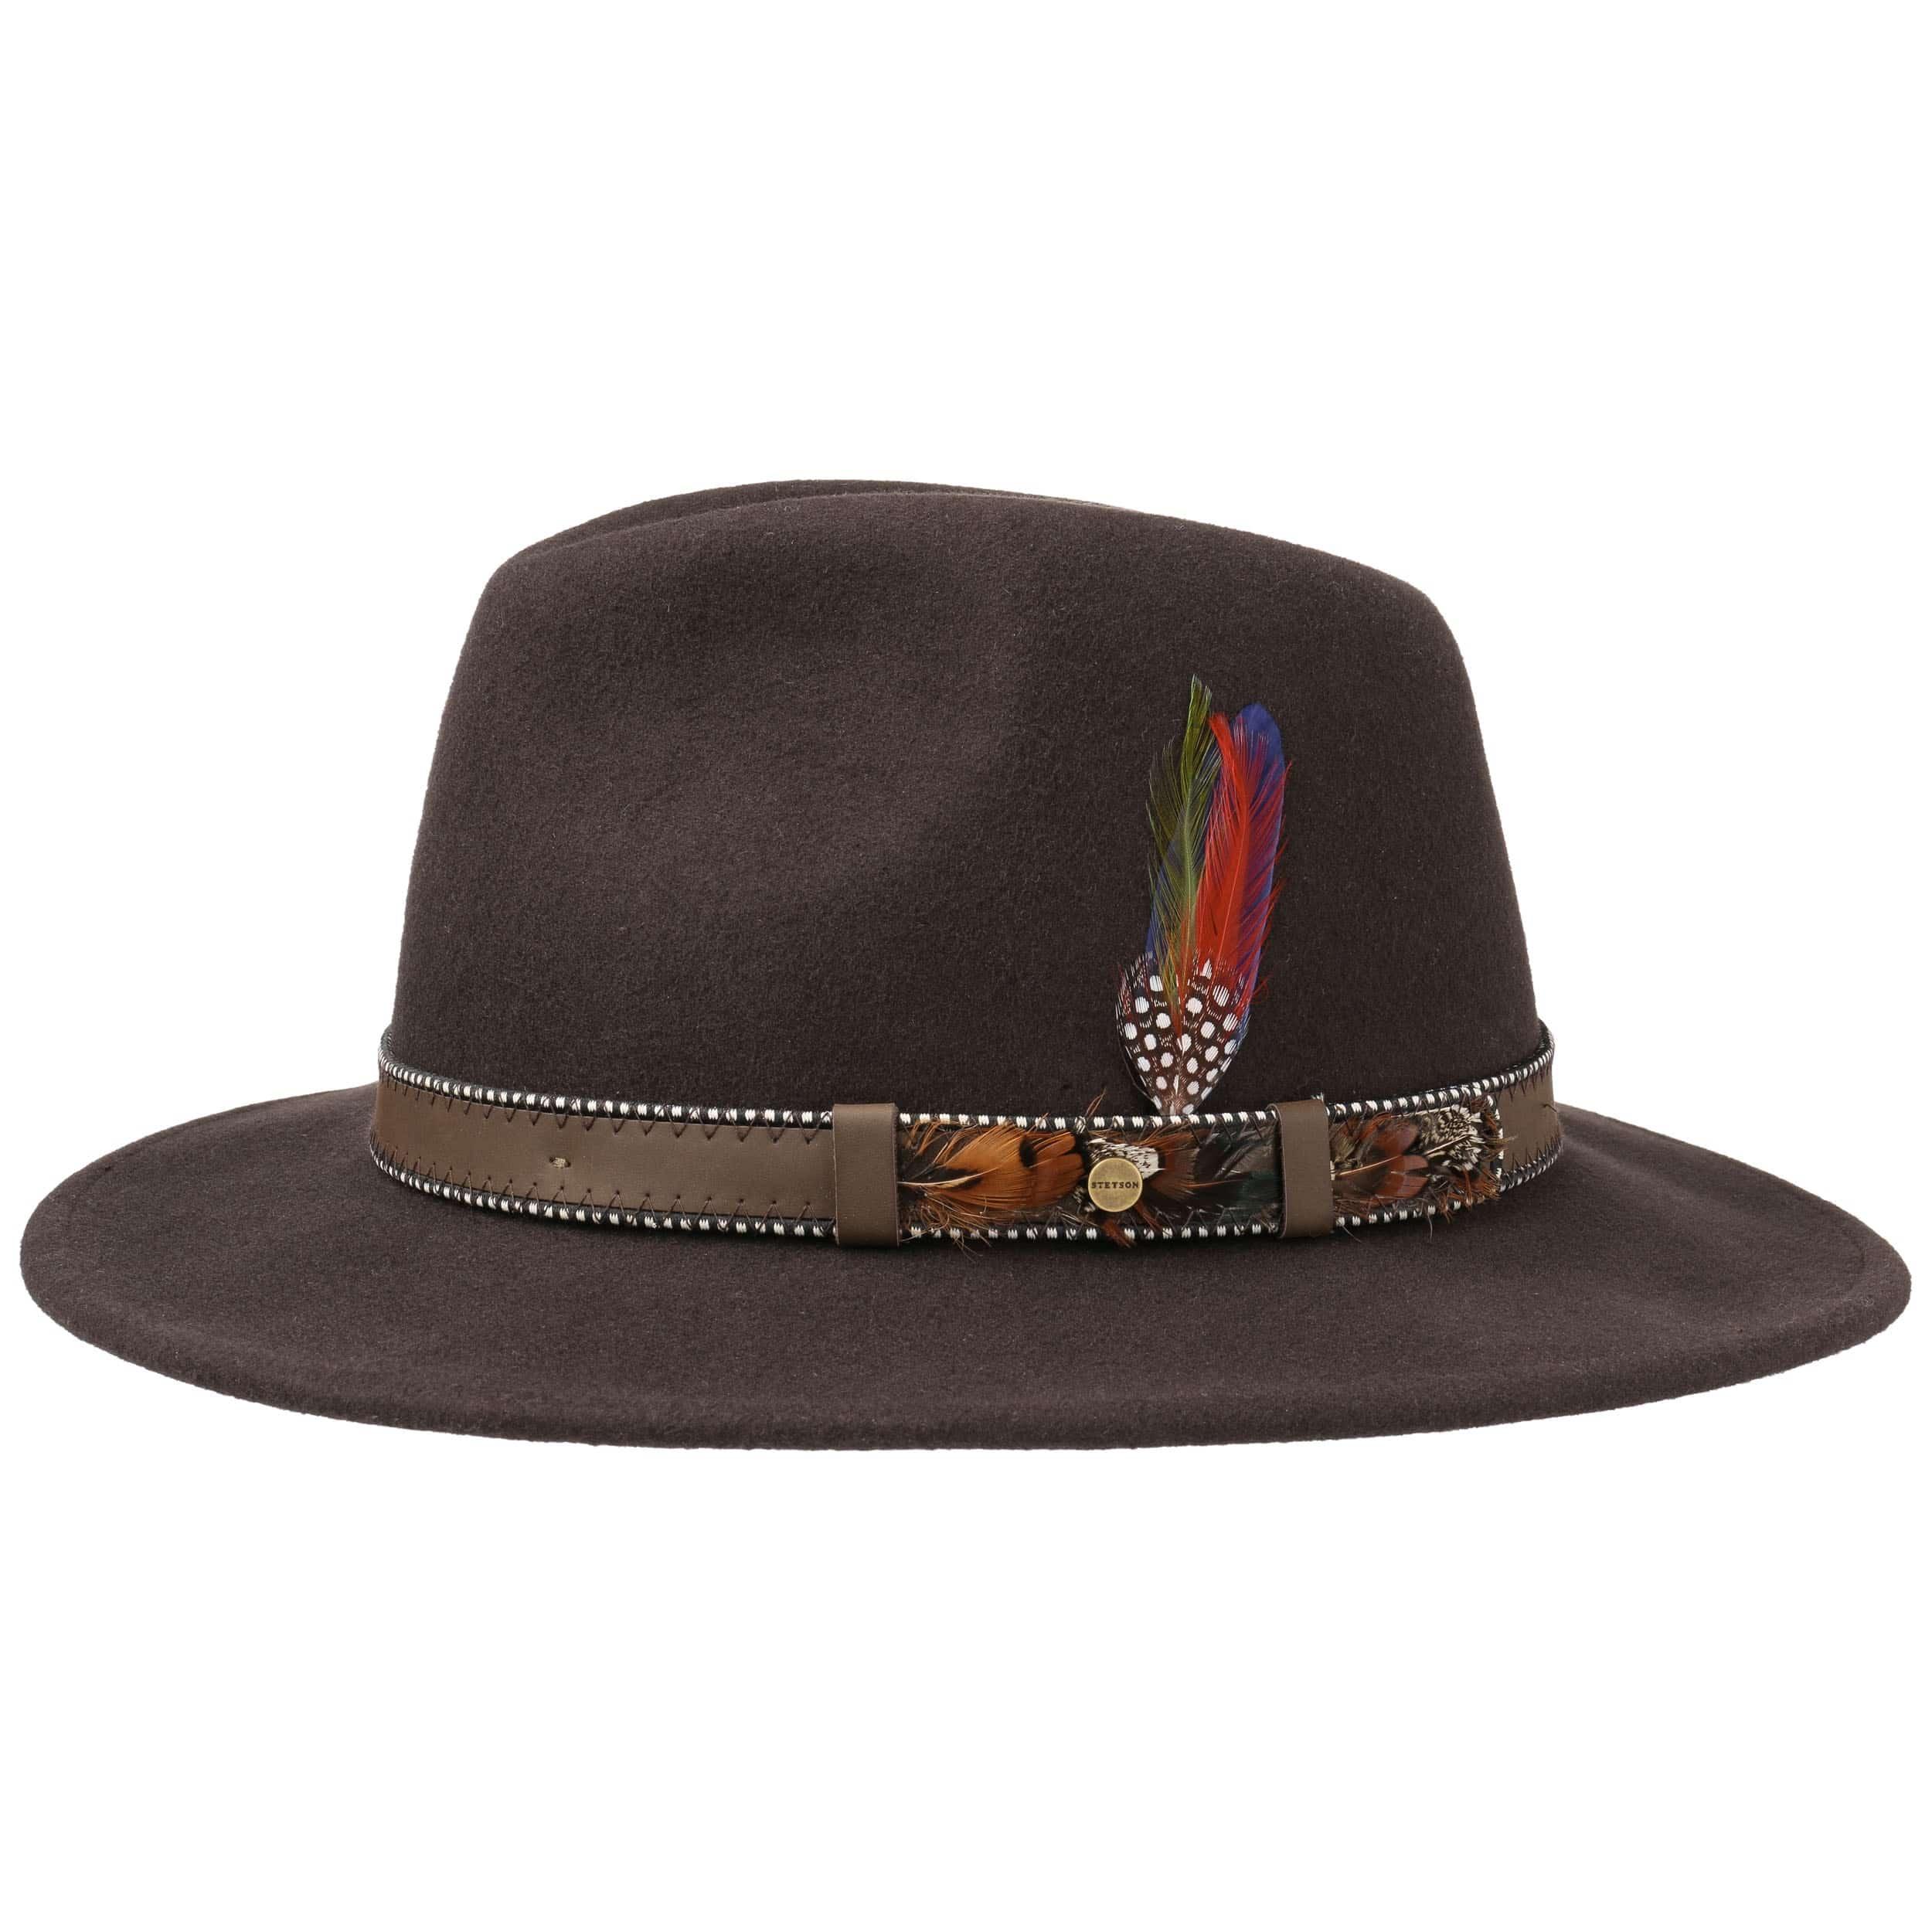 ... Vining Traveller Wool Felt Hat by Stetson - brown 5 ... 8996685e52f